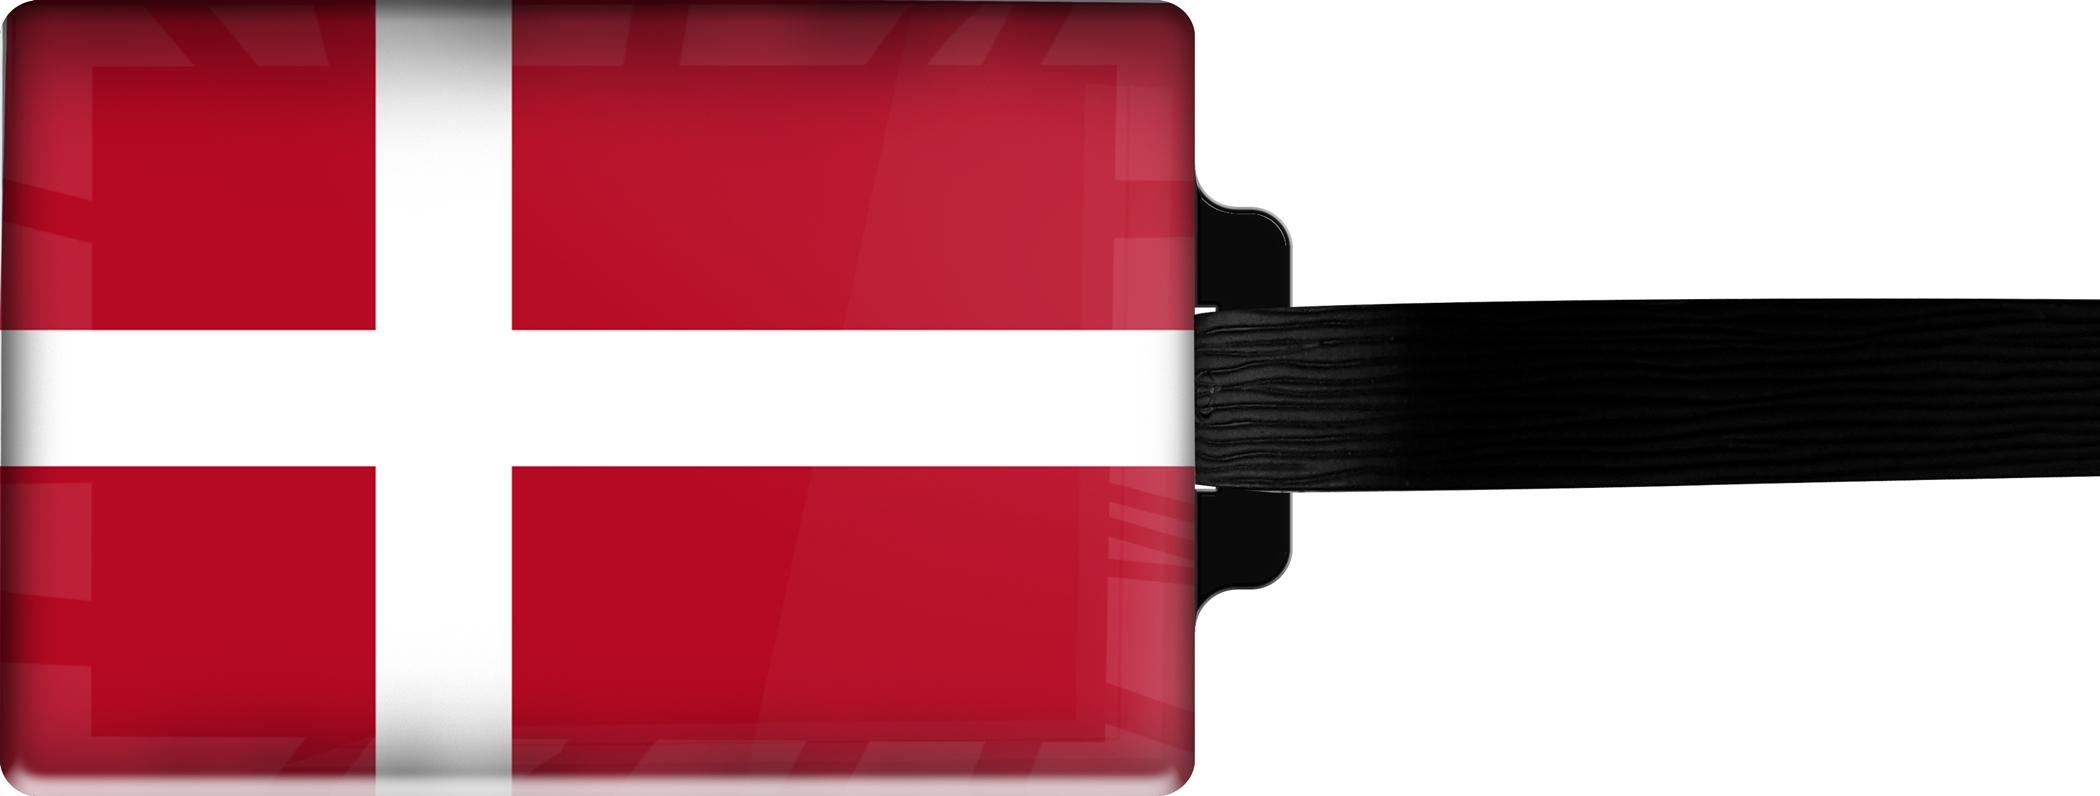 Hochwertiger Gepäckanhänger aus Acrylglas | FLAGGE DÄNEMARK | metALUm #00069